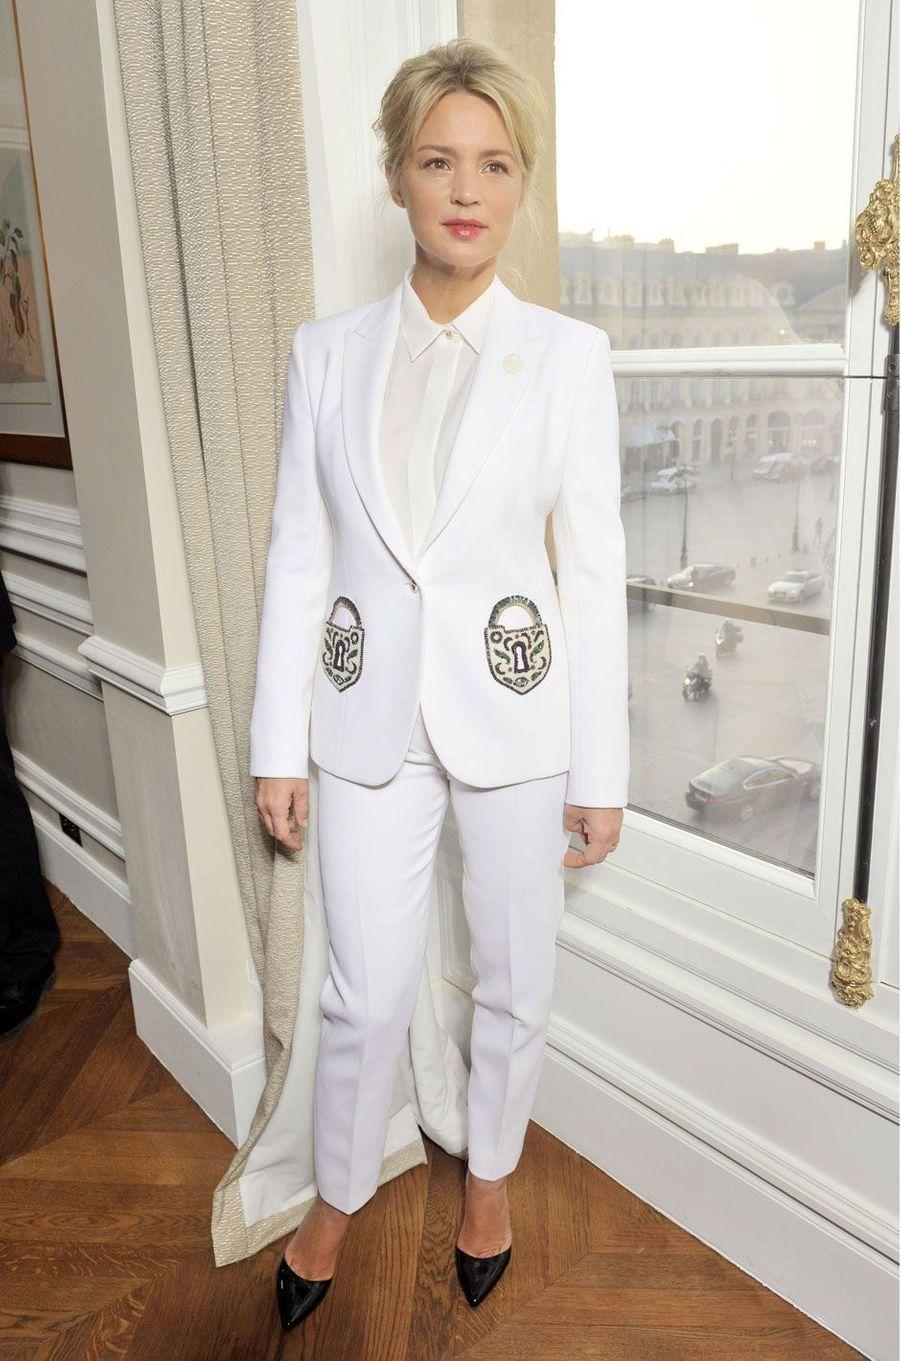 Virginie Efira très chic en costume blanc